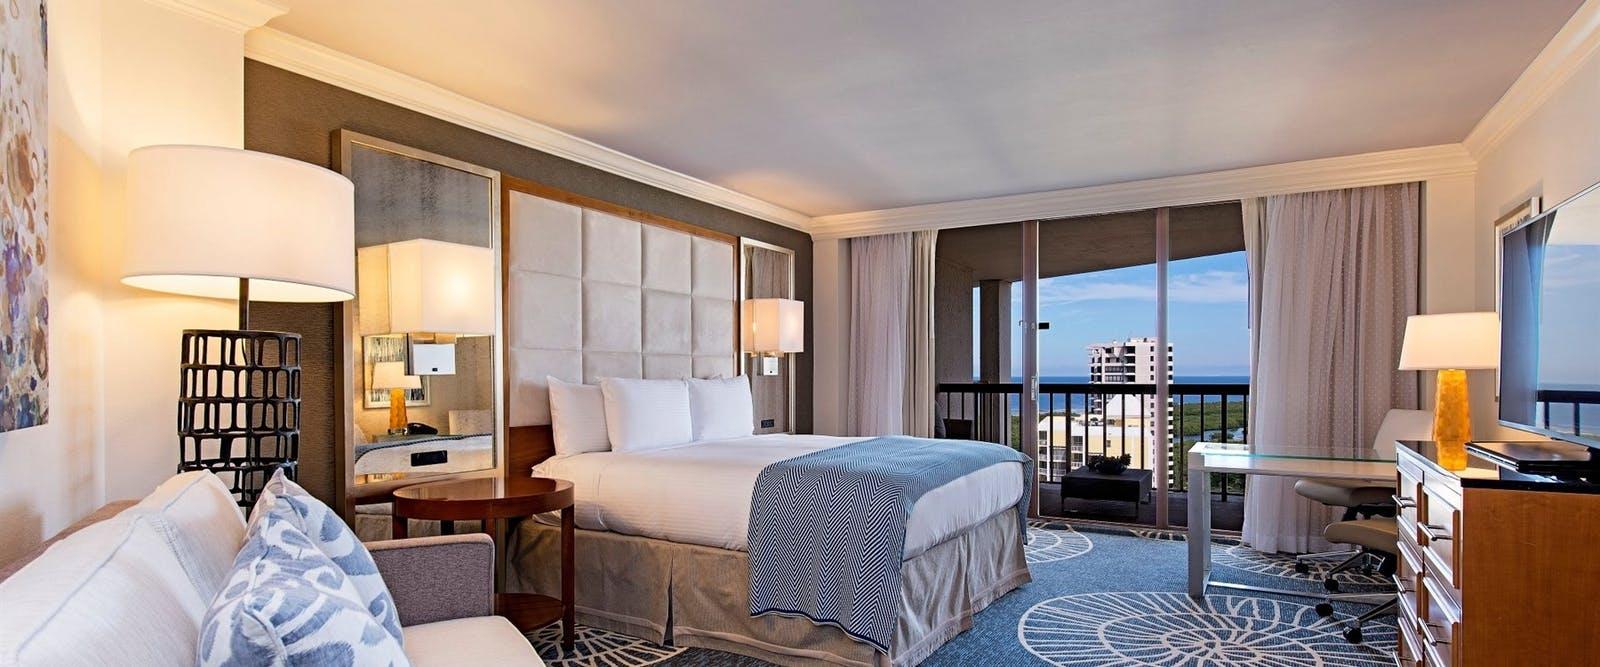 Naples Grande Beach Resort | Inspiring Travel Company